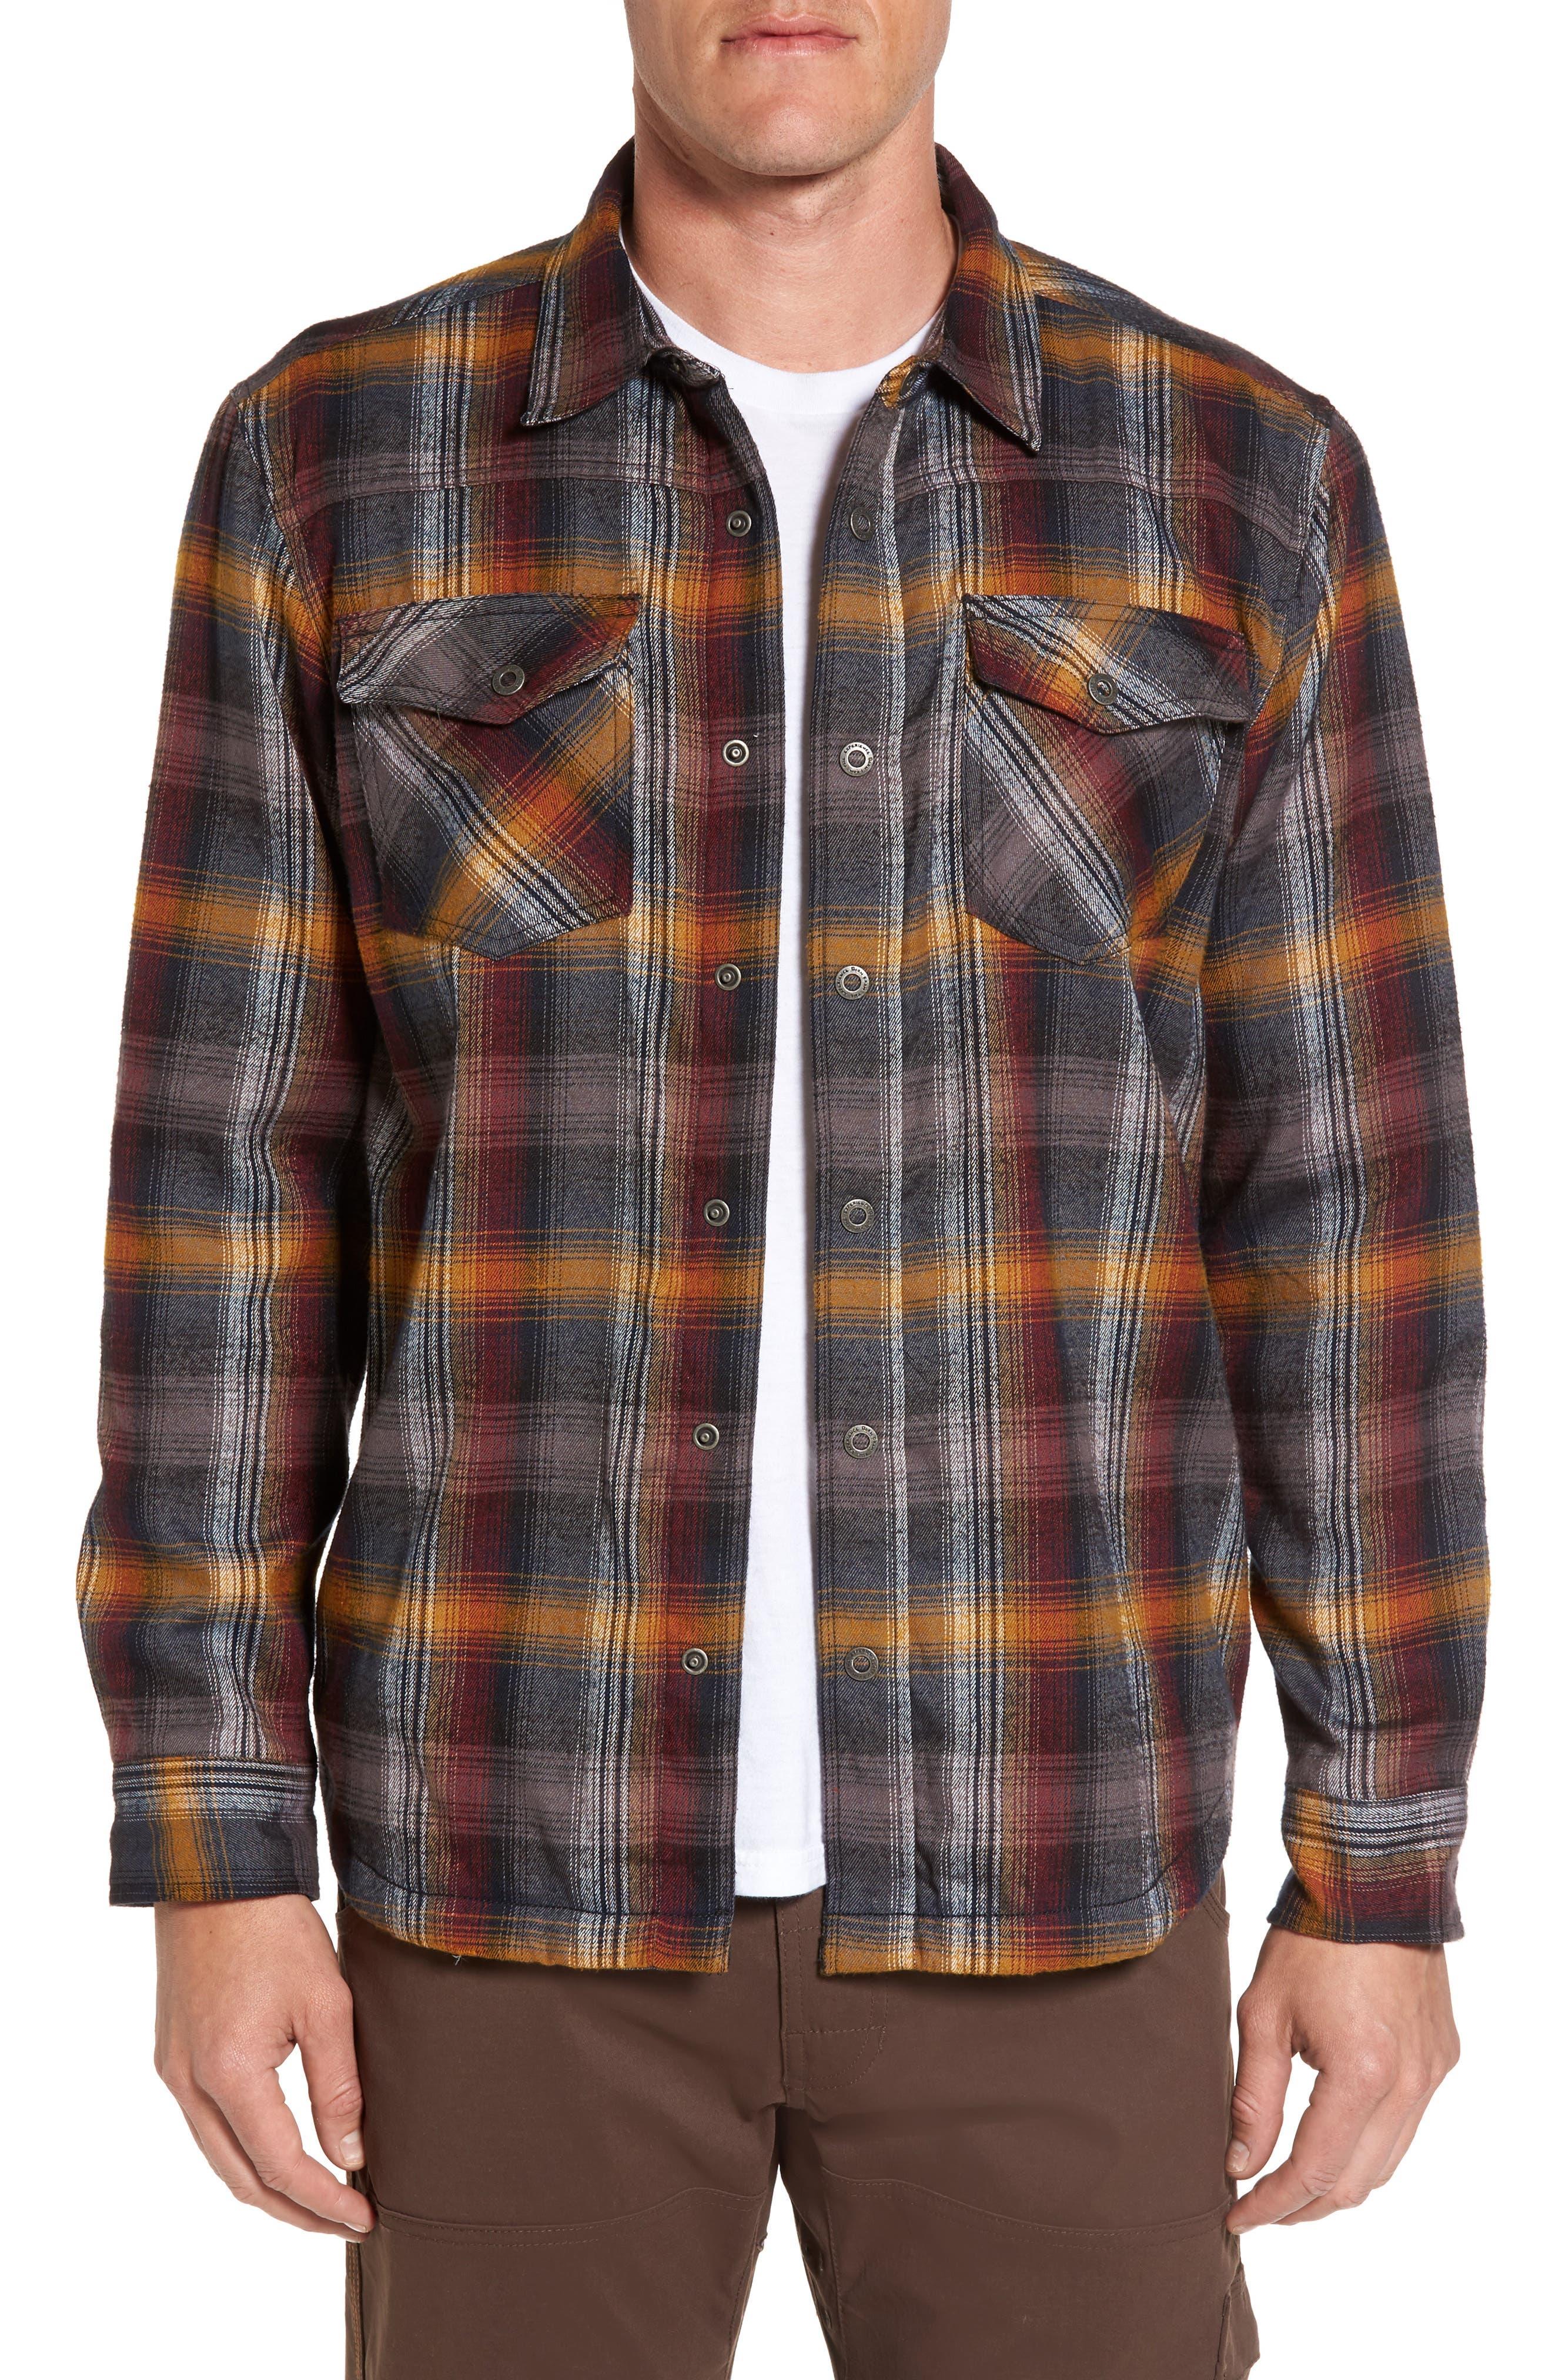 Asylum Regular Fit Plaid Shirt Jacket,                             Main thumbnail 1, color,                             001